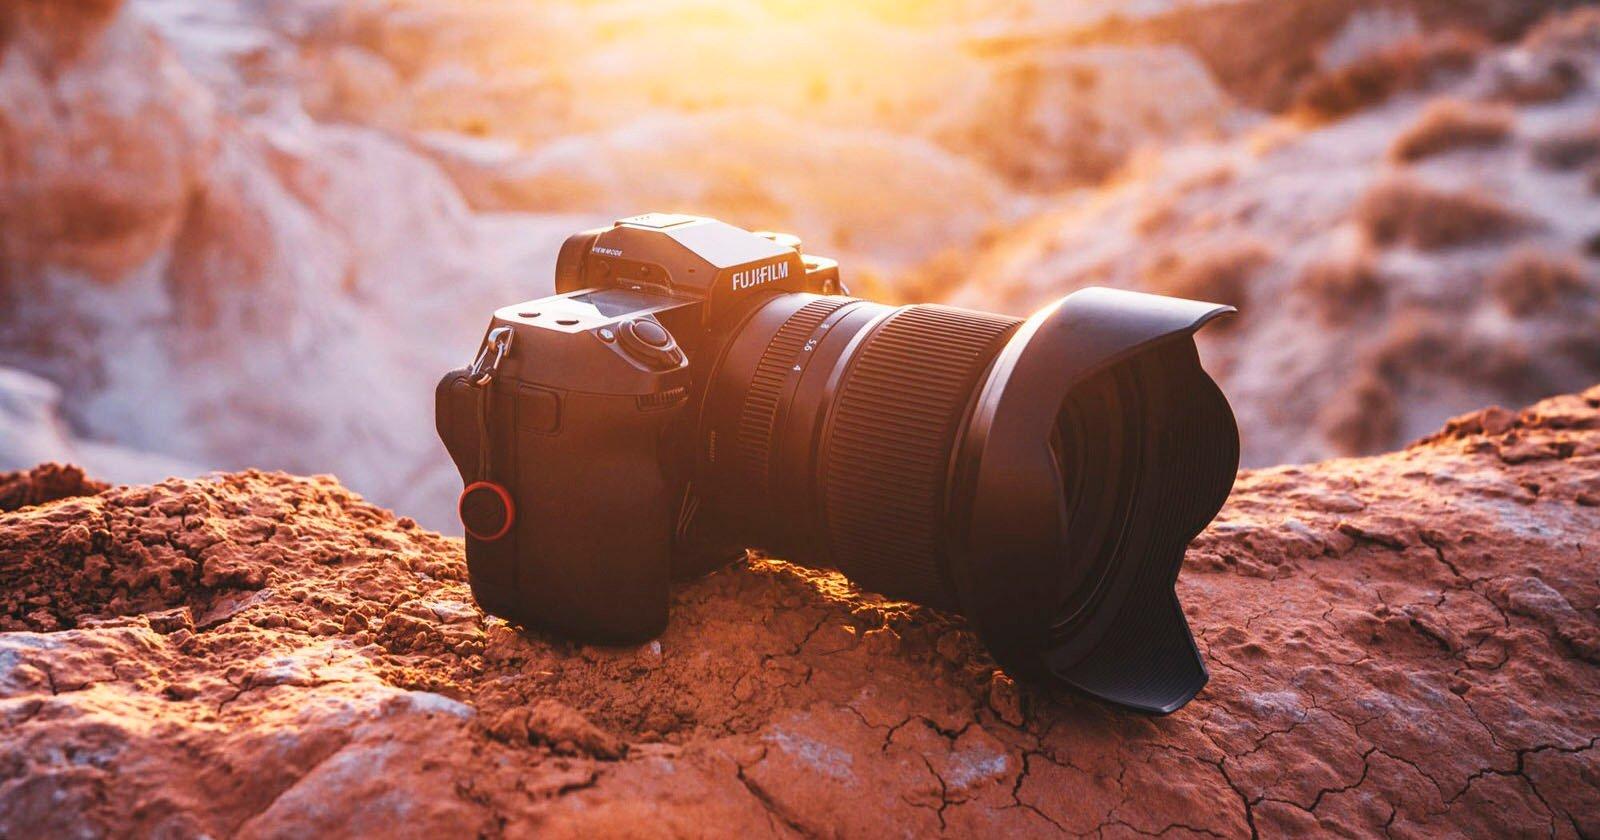 Fuji GFX 100S: I Found the Landscape Photography Camera of My Dreams